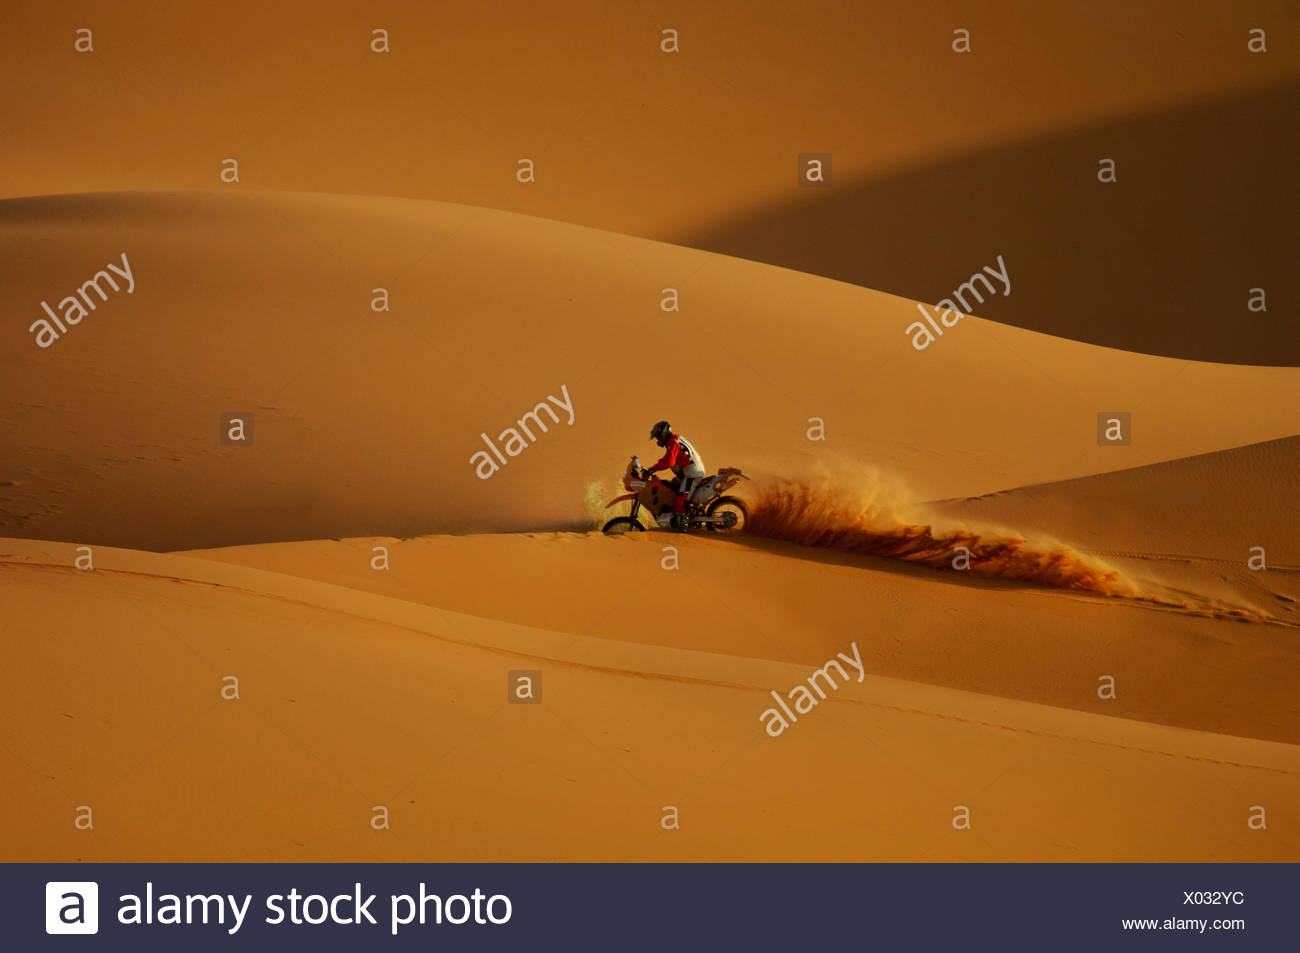 Offroad motorcycle motorbike motorcyclist adventure erg Chebbi desert sand dunes sand desert Merzouga Morocco North Africa - Stock Image